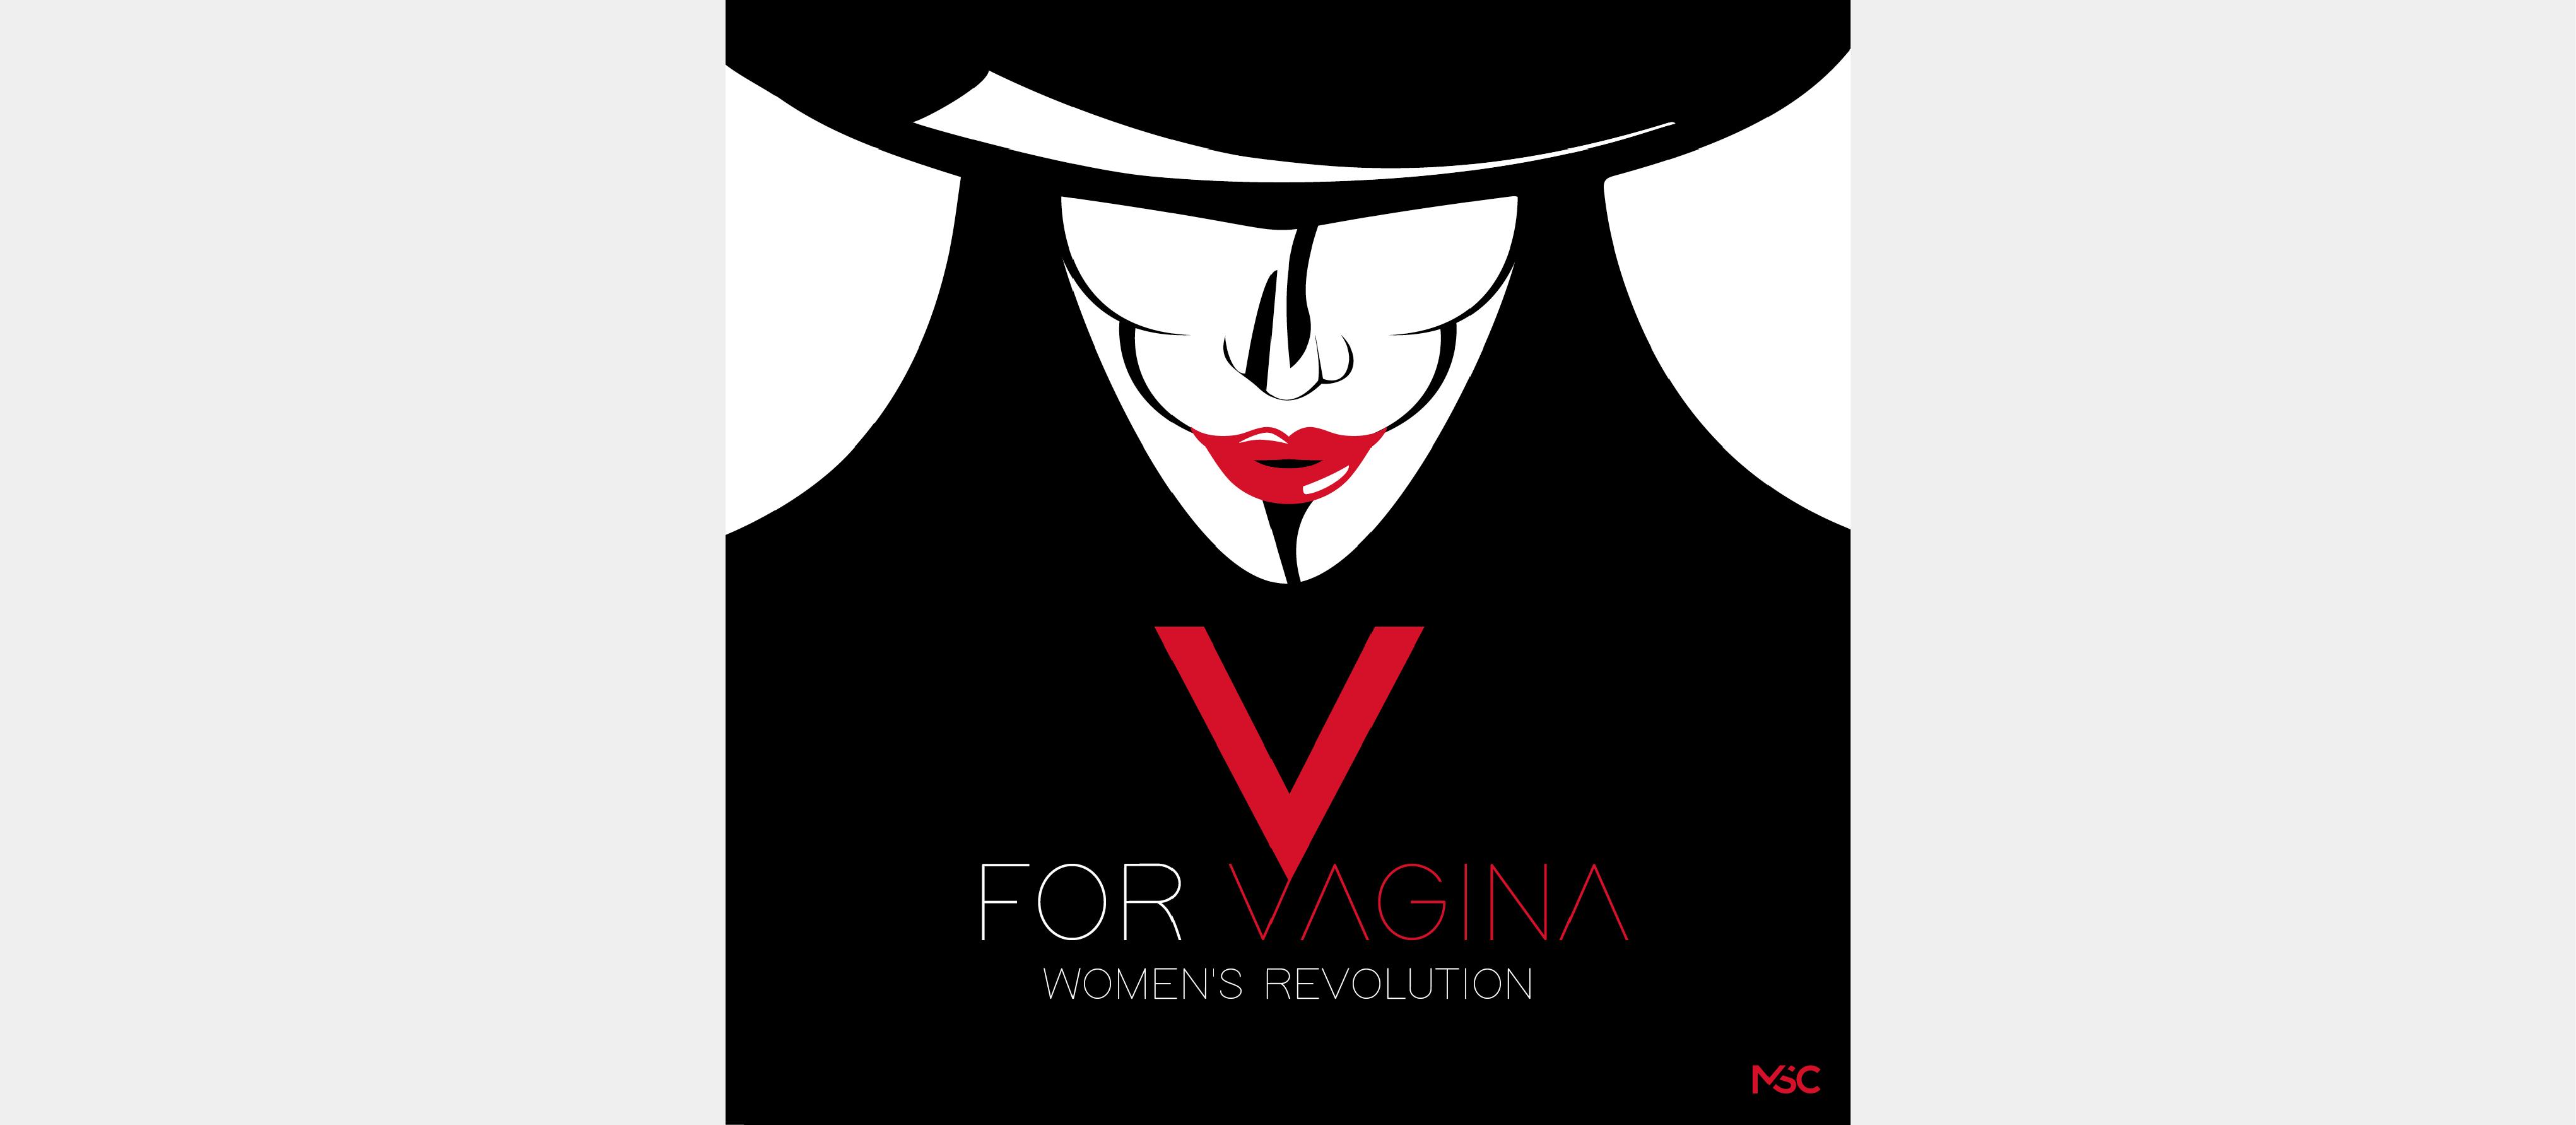 V for Vagina